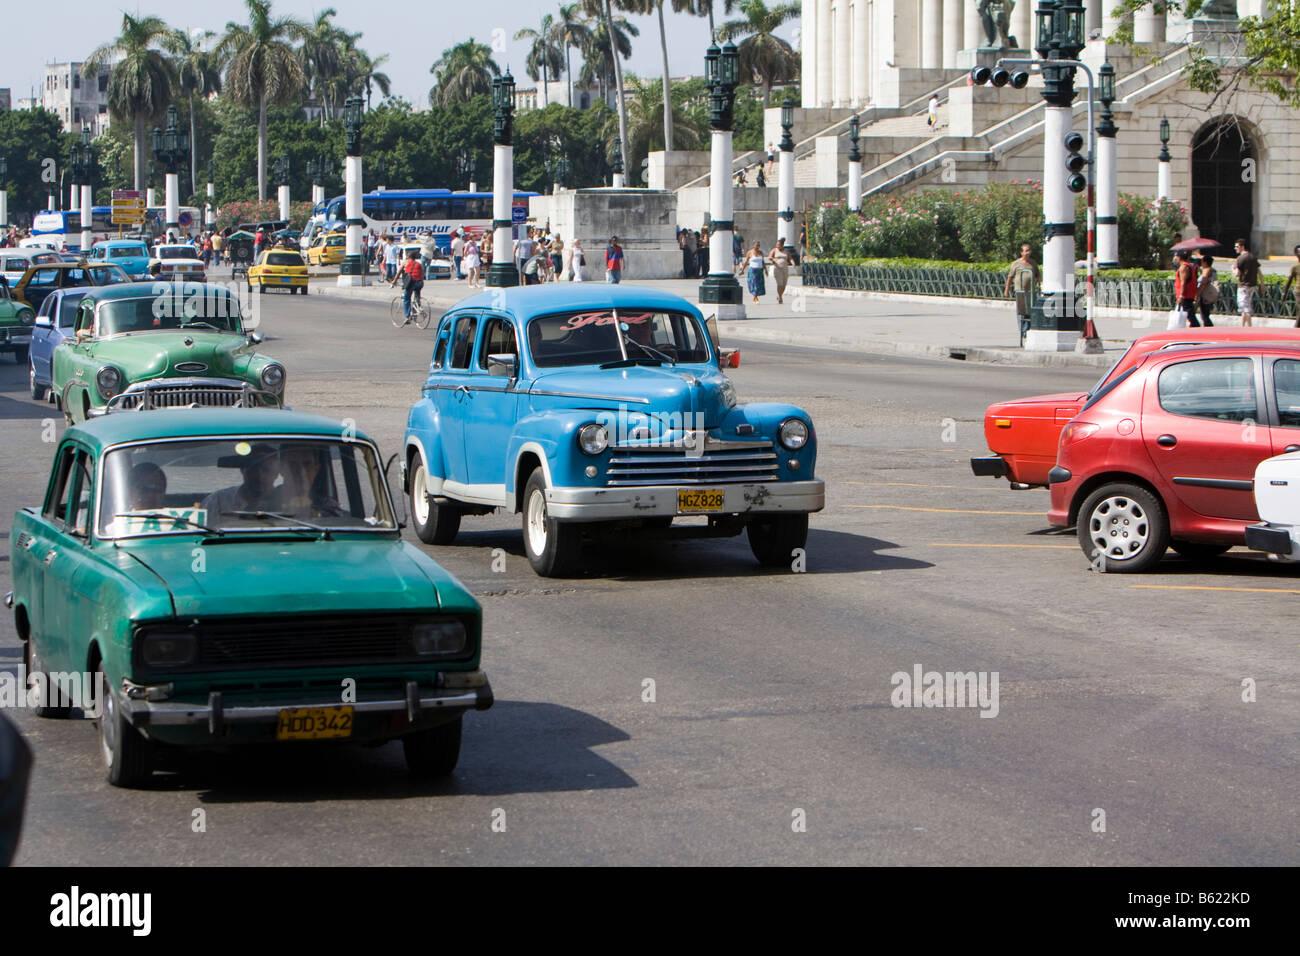 Traffic consisting of old cars, Havana, Cuba, Caribbean Stock Photo ...